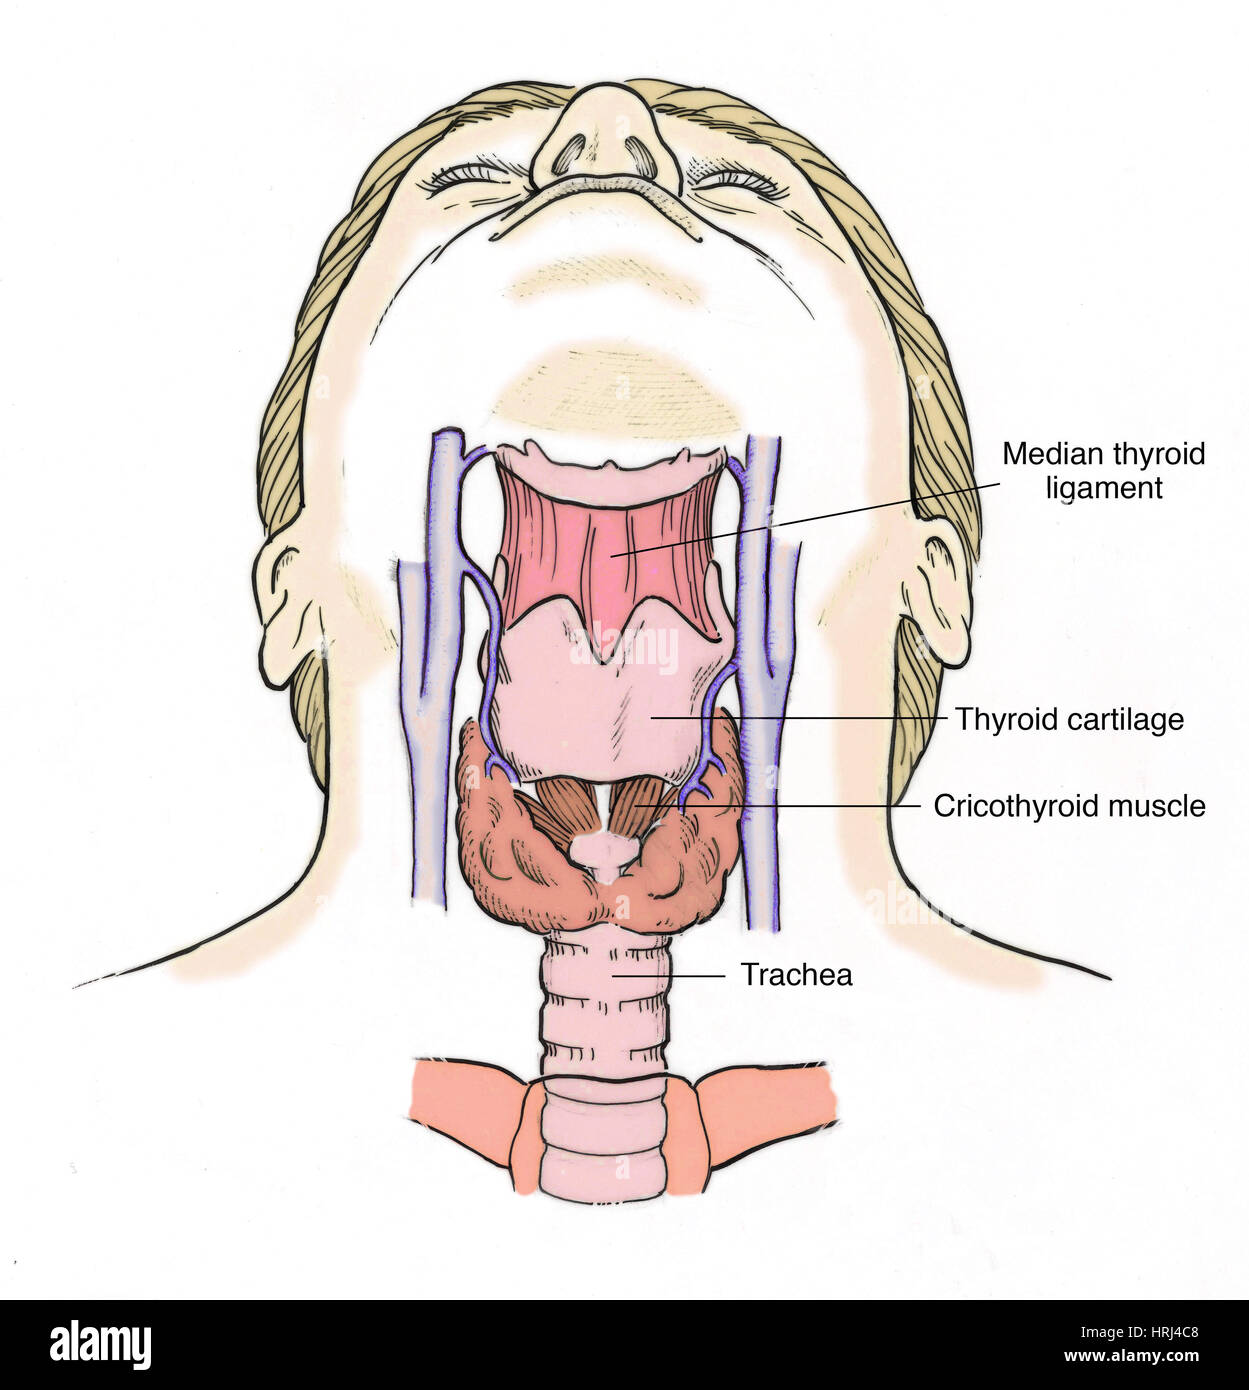 Illustration of Throat Anatomy Stock Photo: 135008280 - Alamy